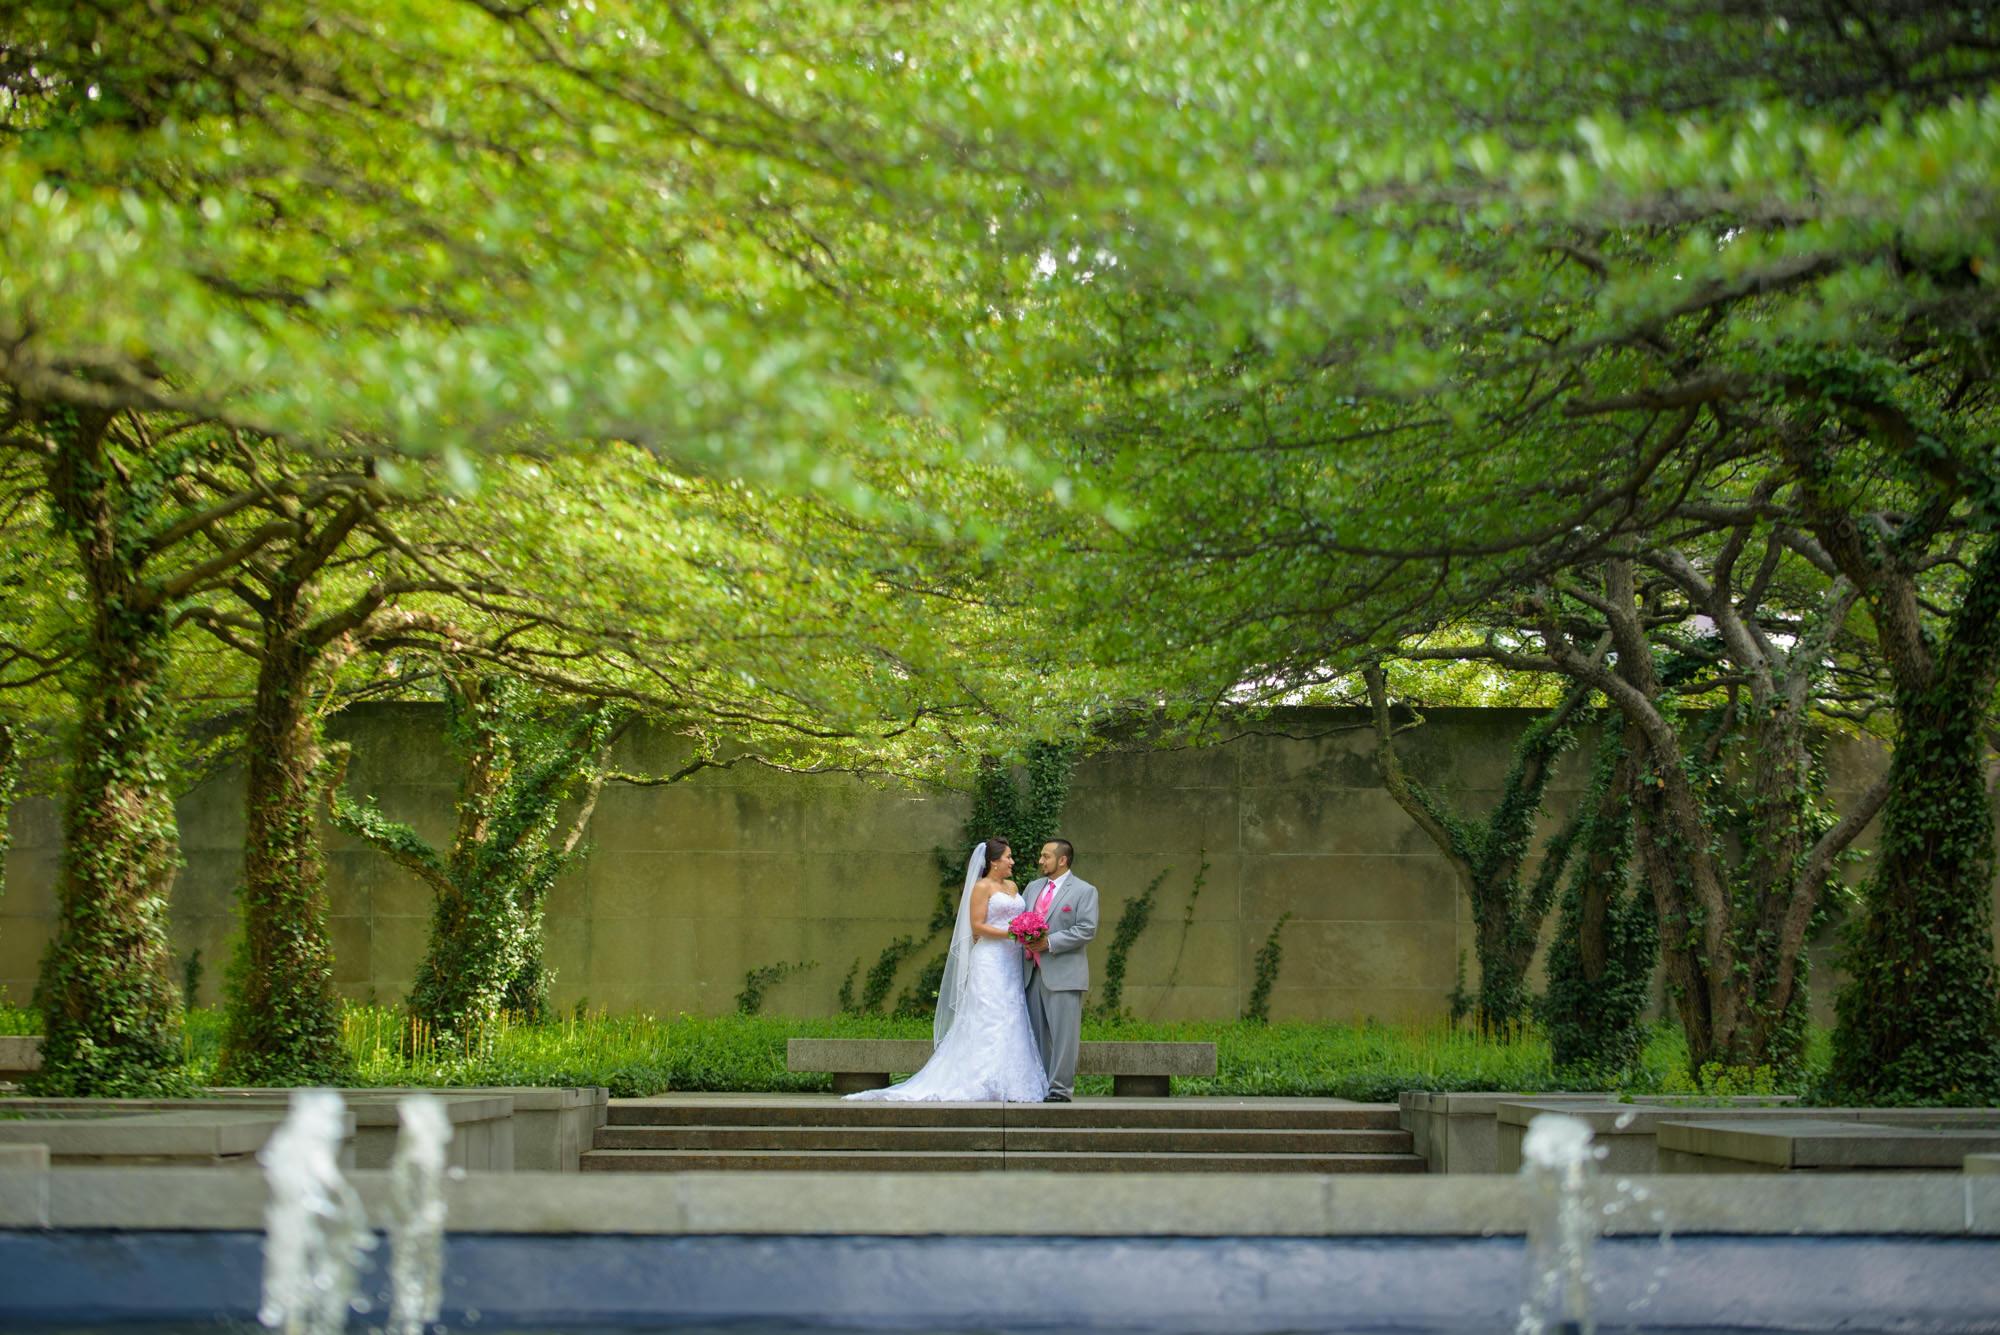 Bride Groom Chicago Art Institute South Garden Trees